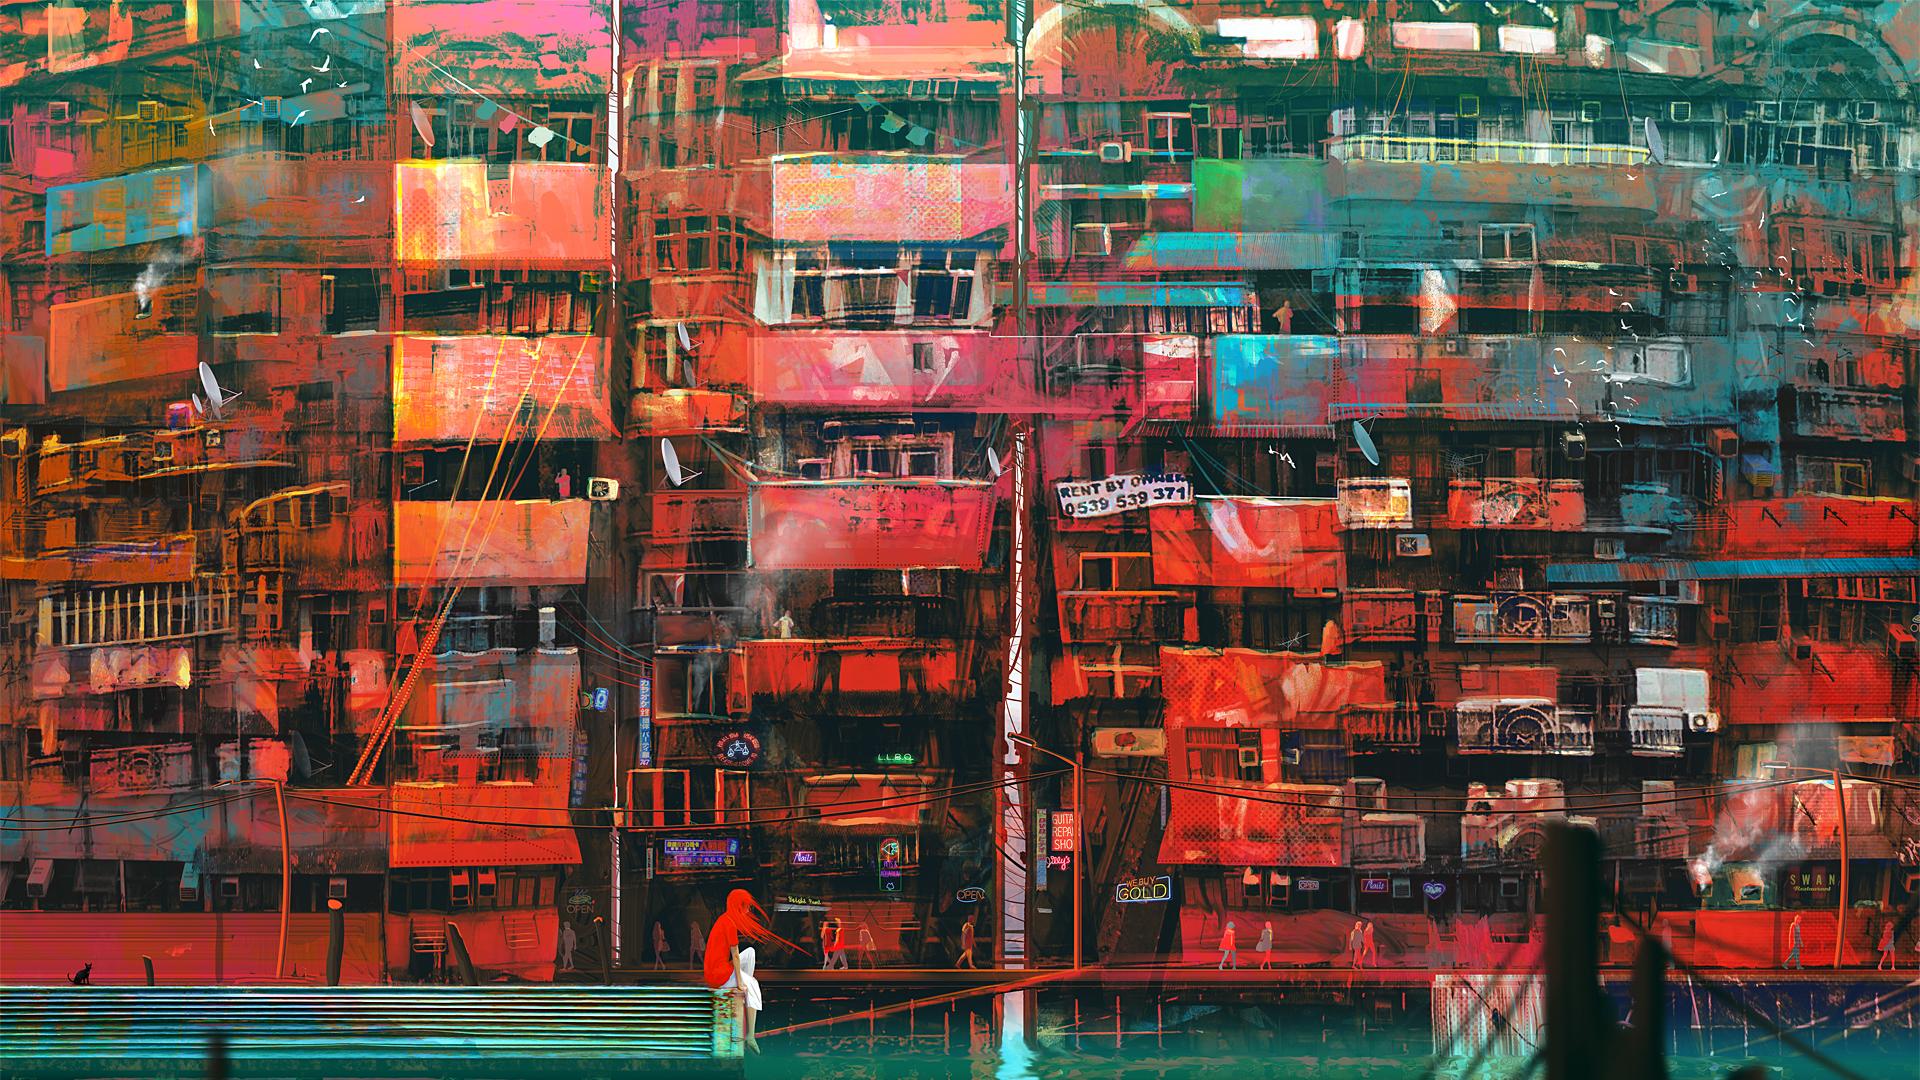 red apartment